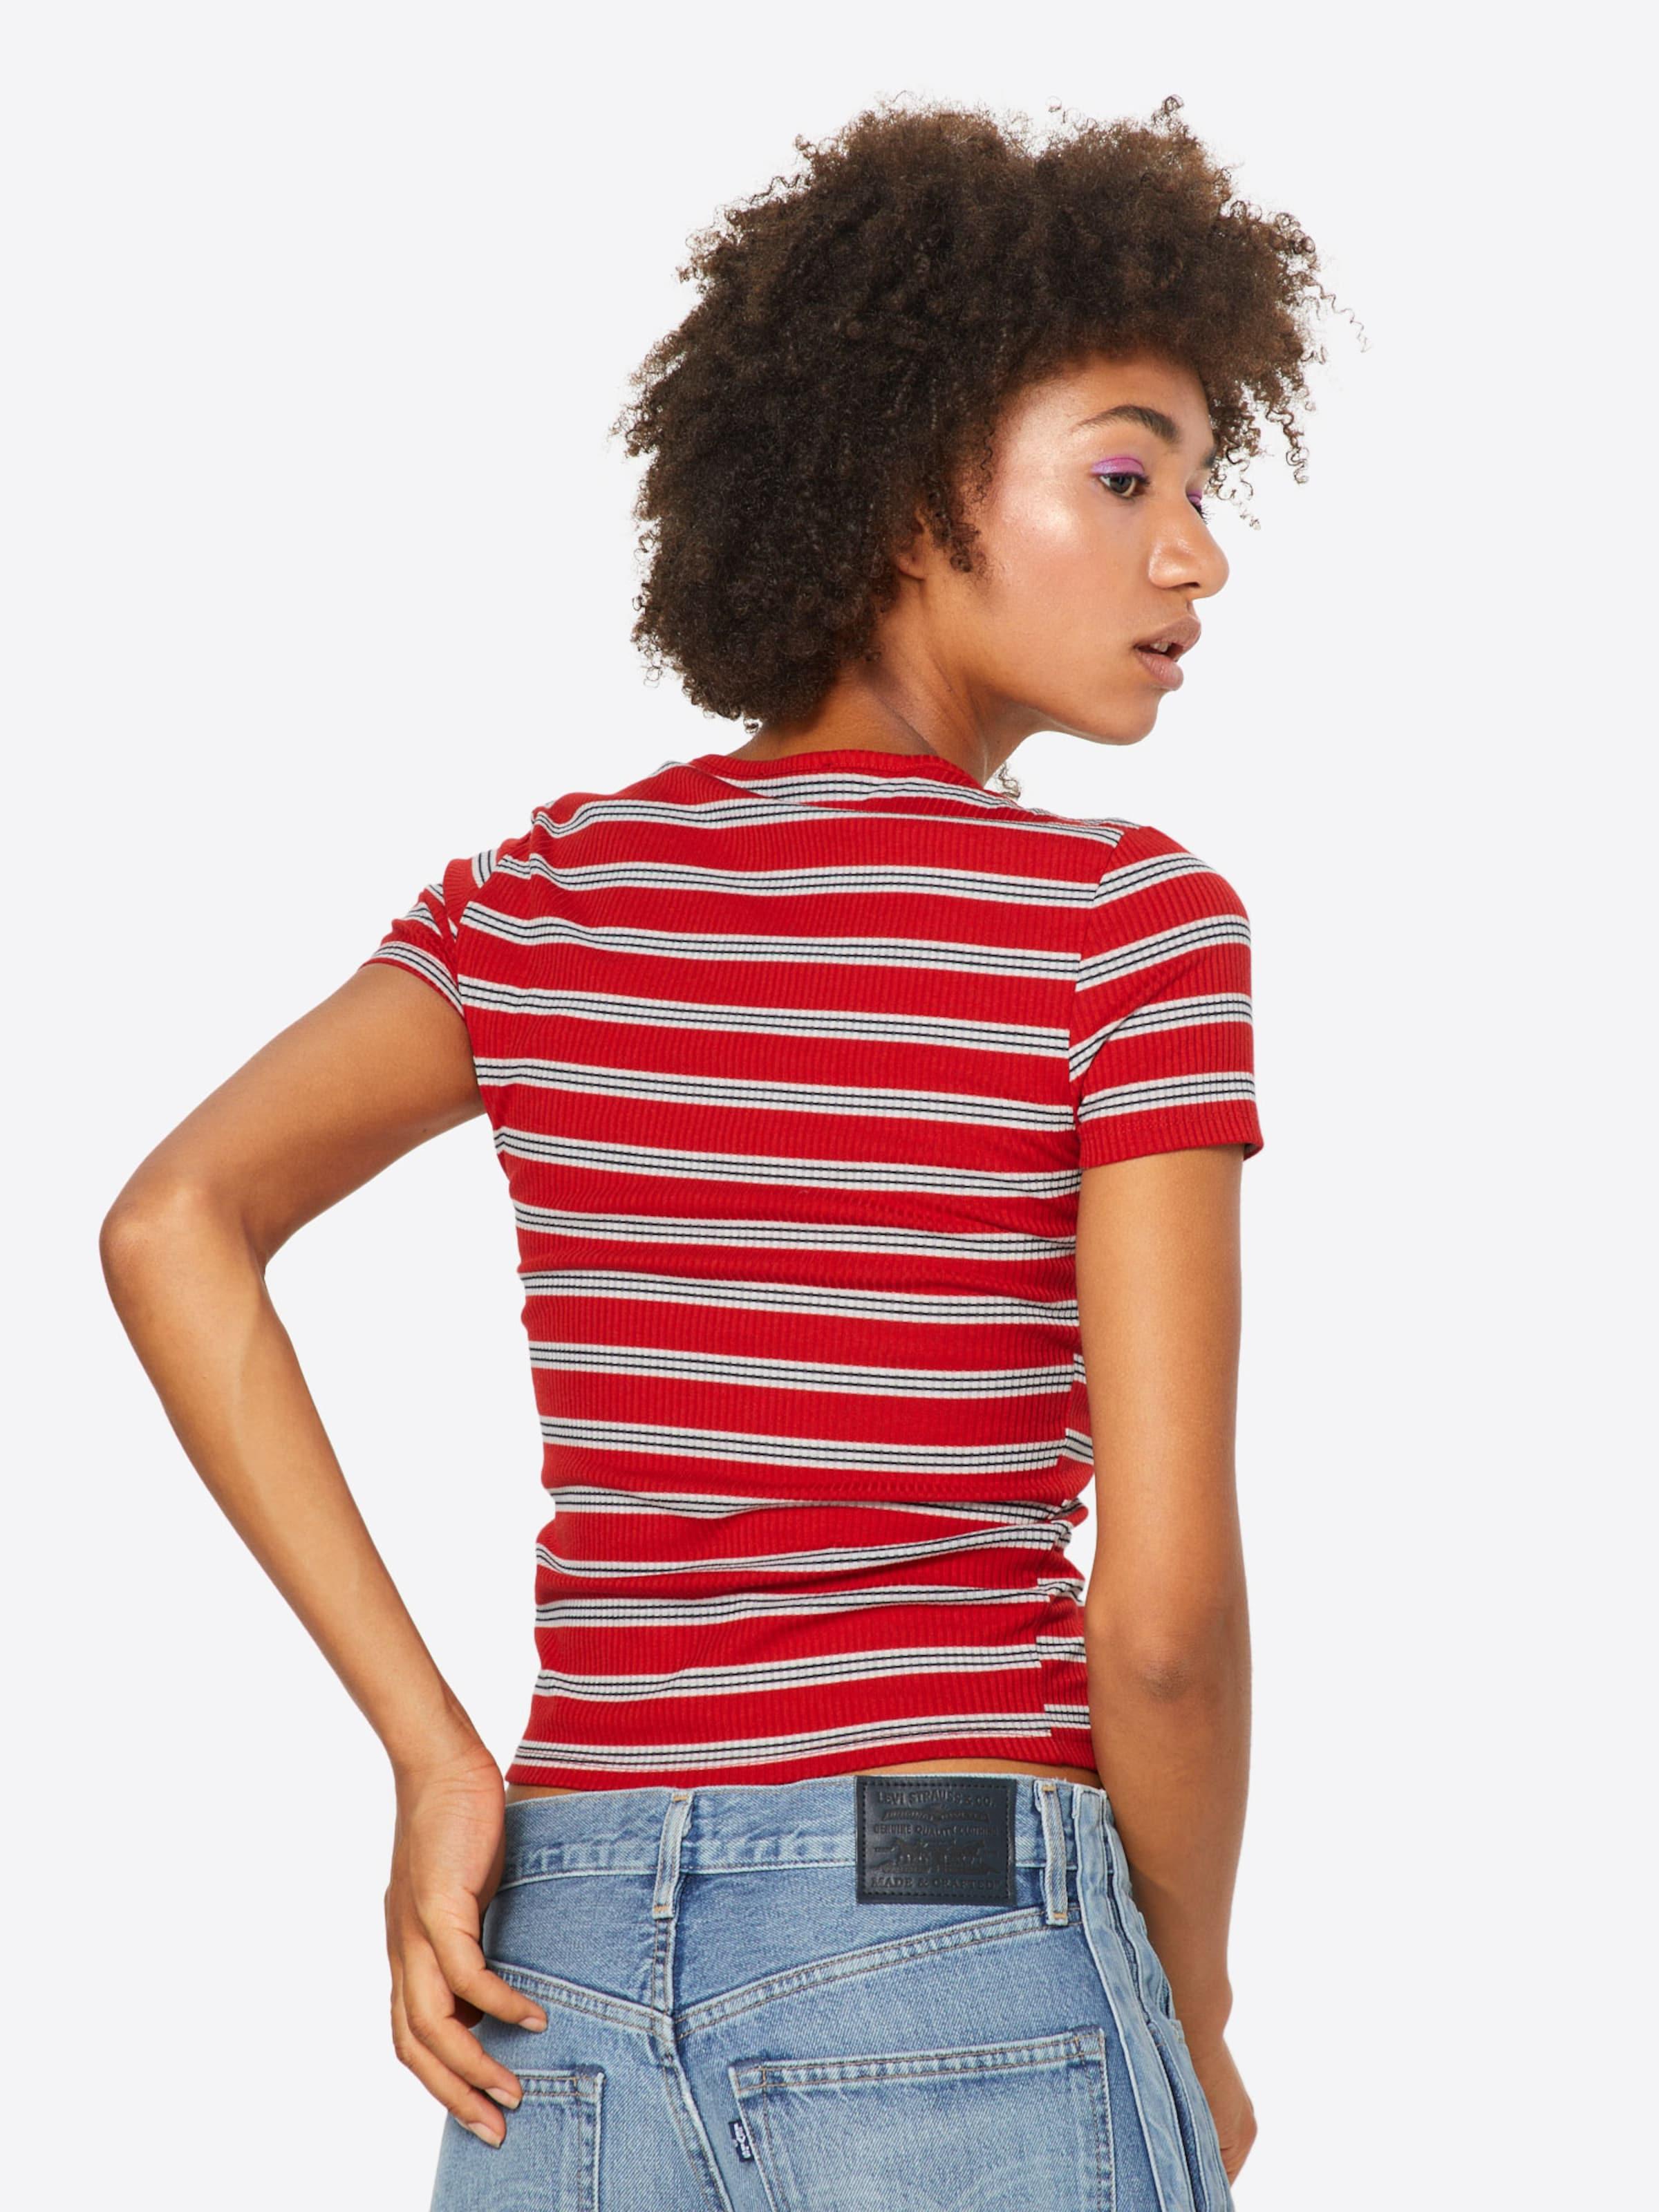 In RotWeiß Look 'henri' shirt T New xedBCo